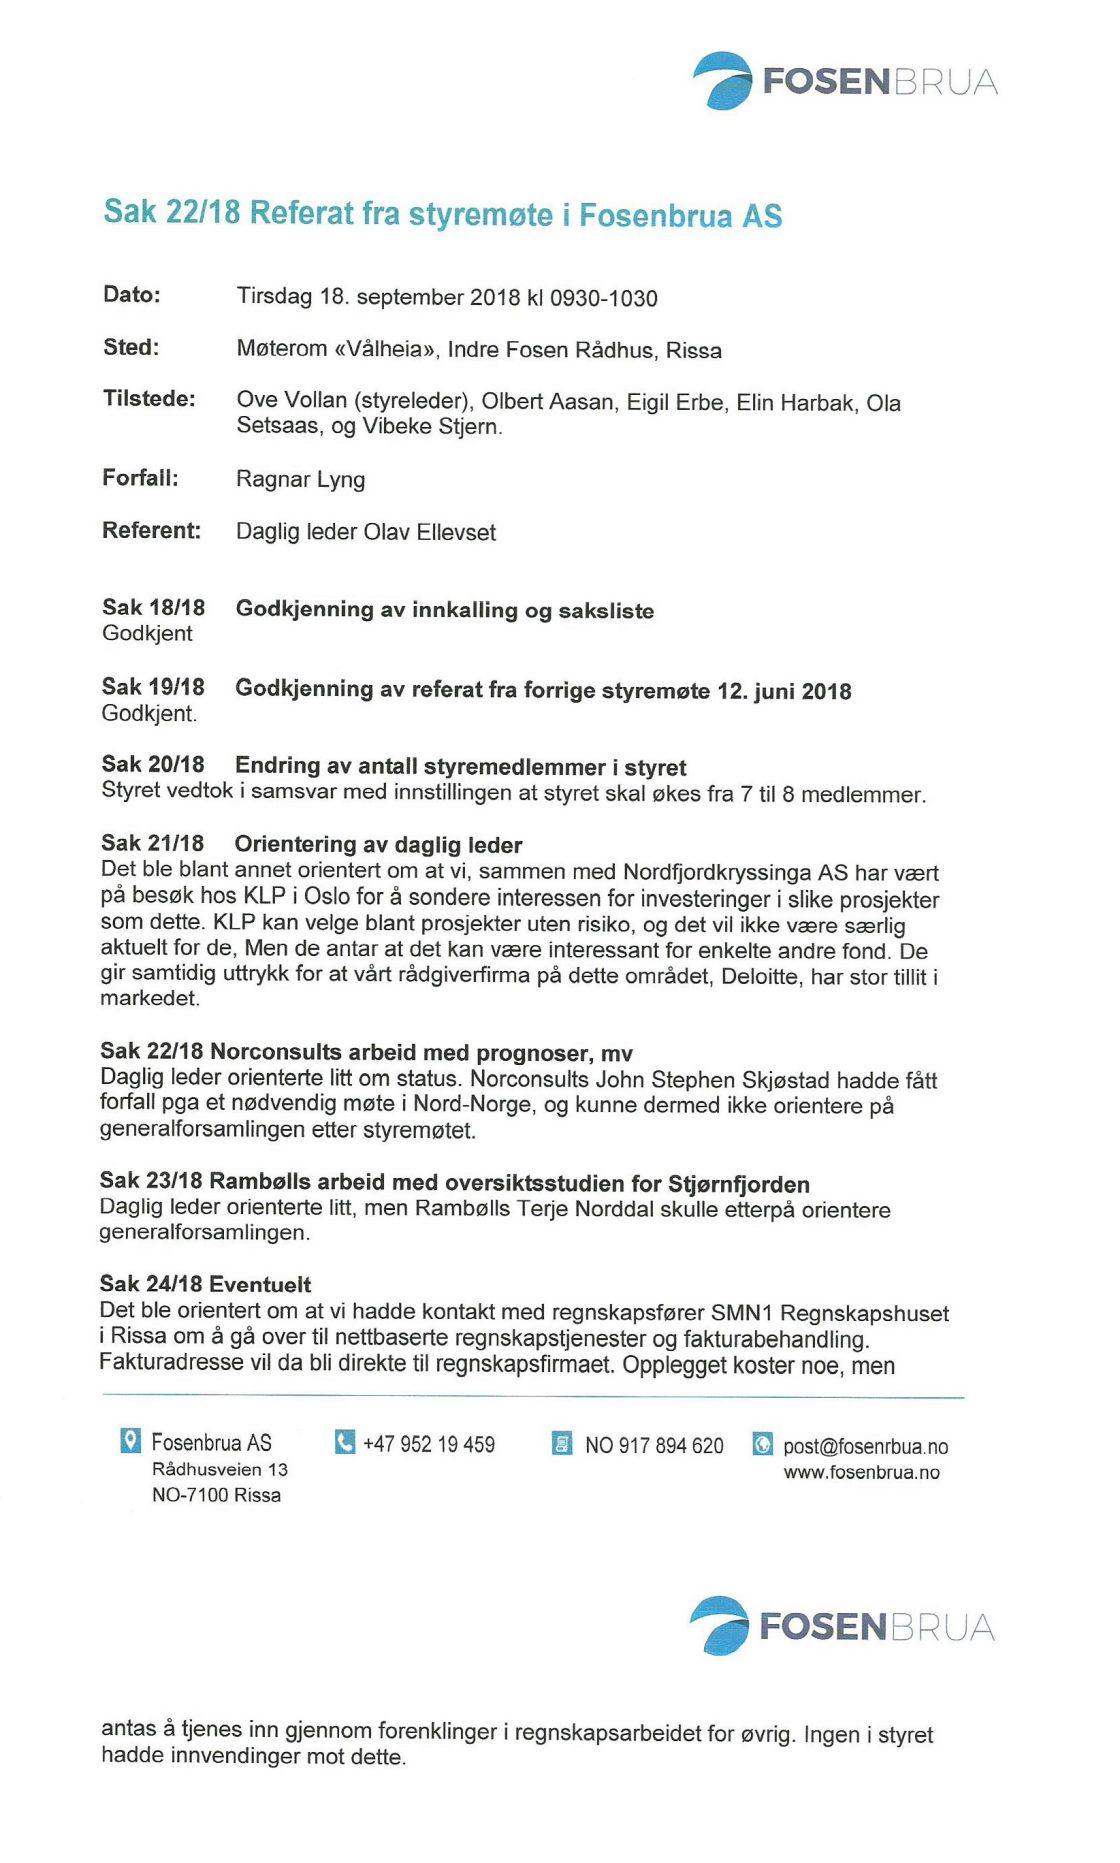 Referat fra styremøte i Fosenbrua AS 18-09-18